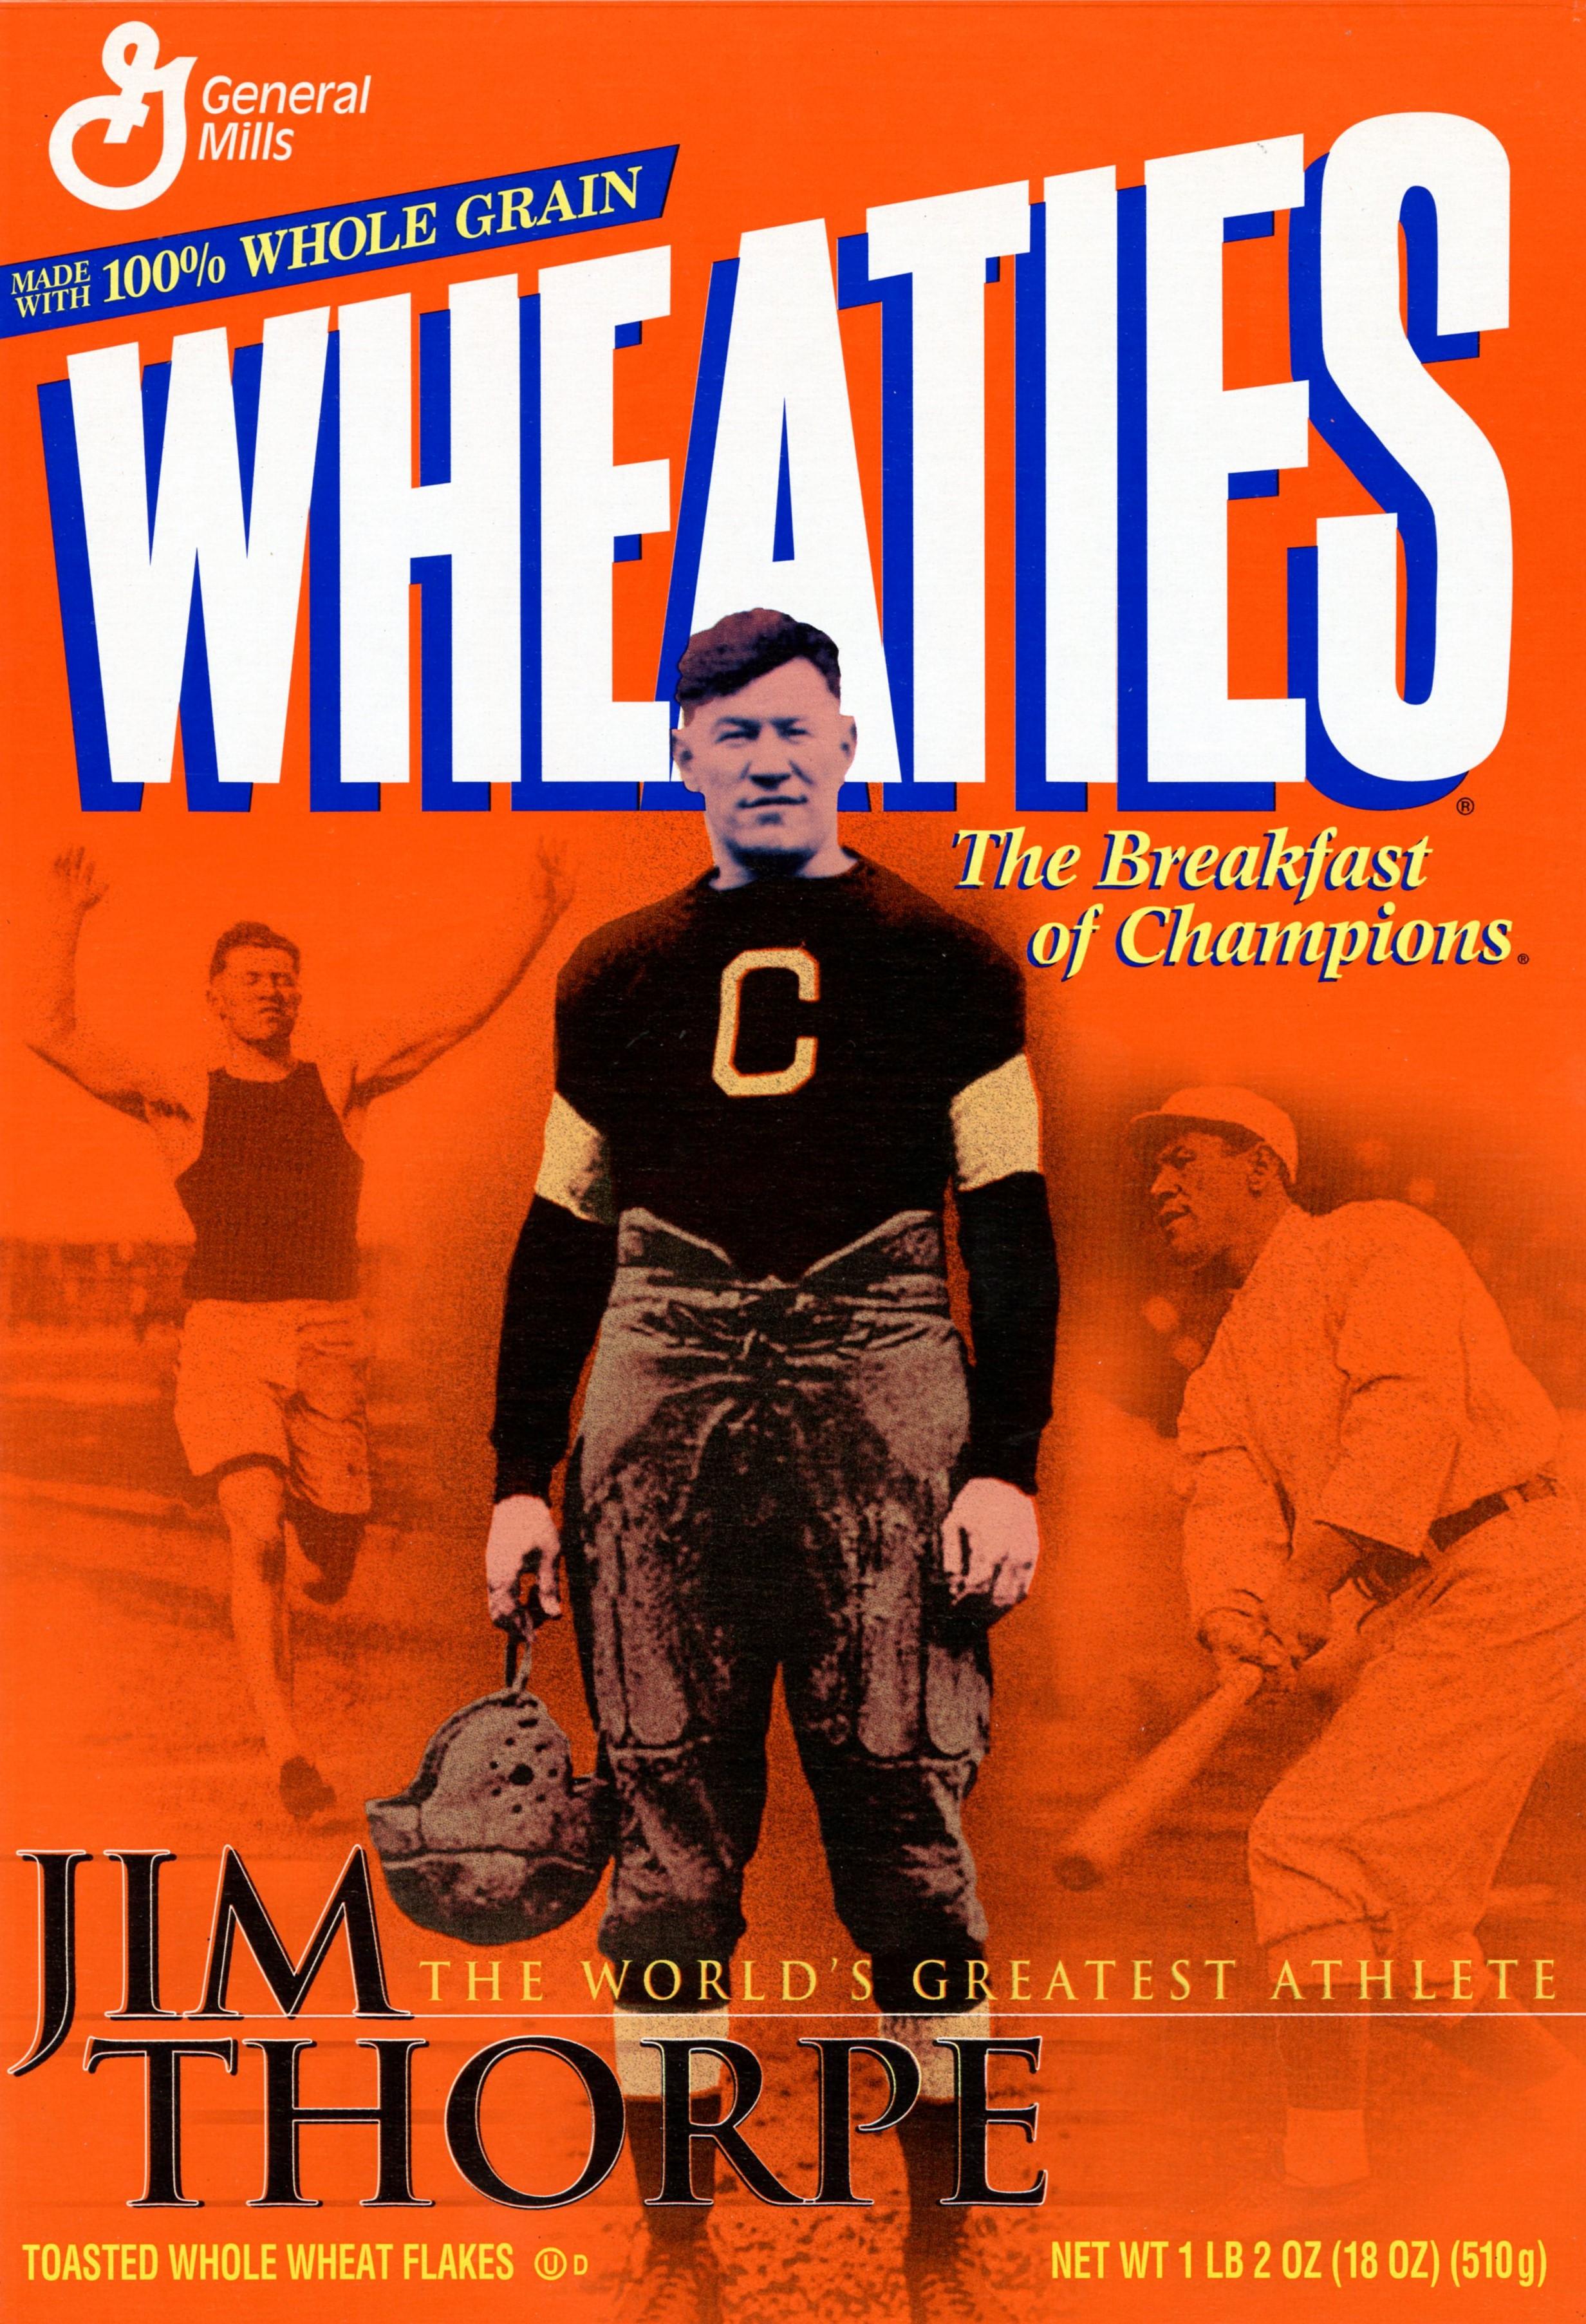 Jim Thorpe on the Wheaties box.